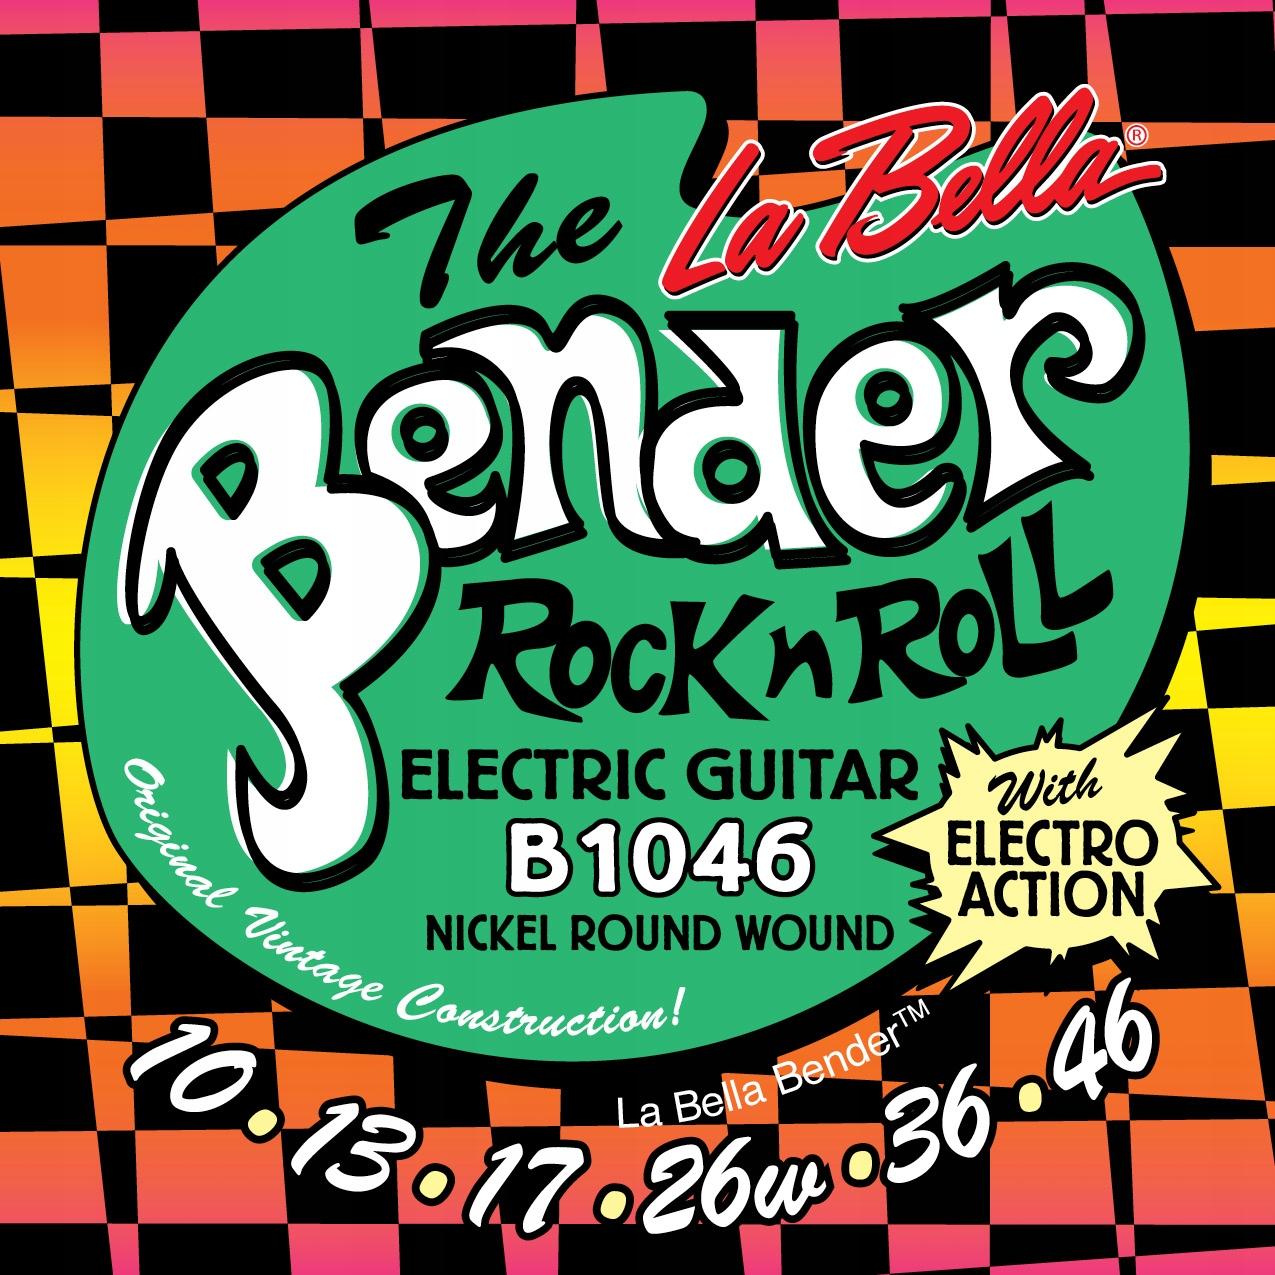 Struny do gitary elektrycznej LA Bella Bender 1046